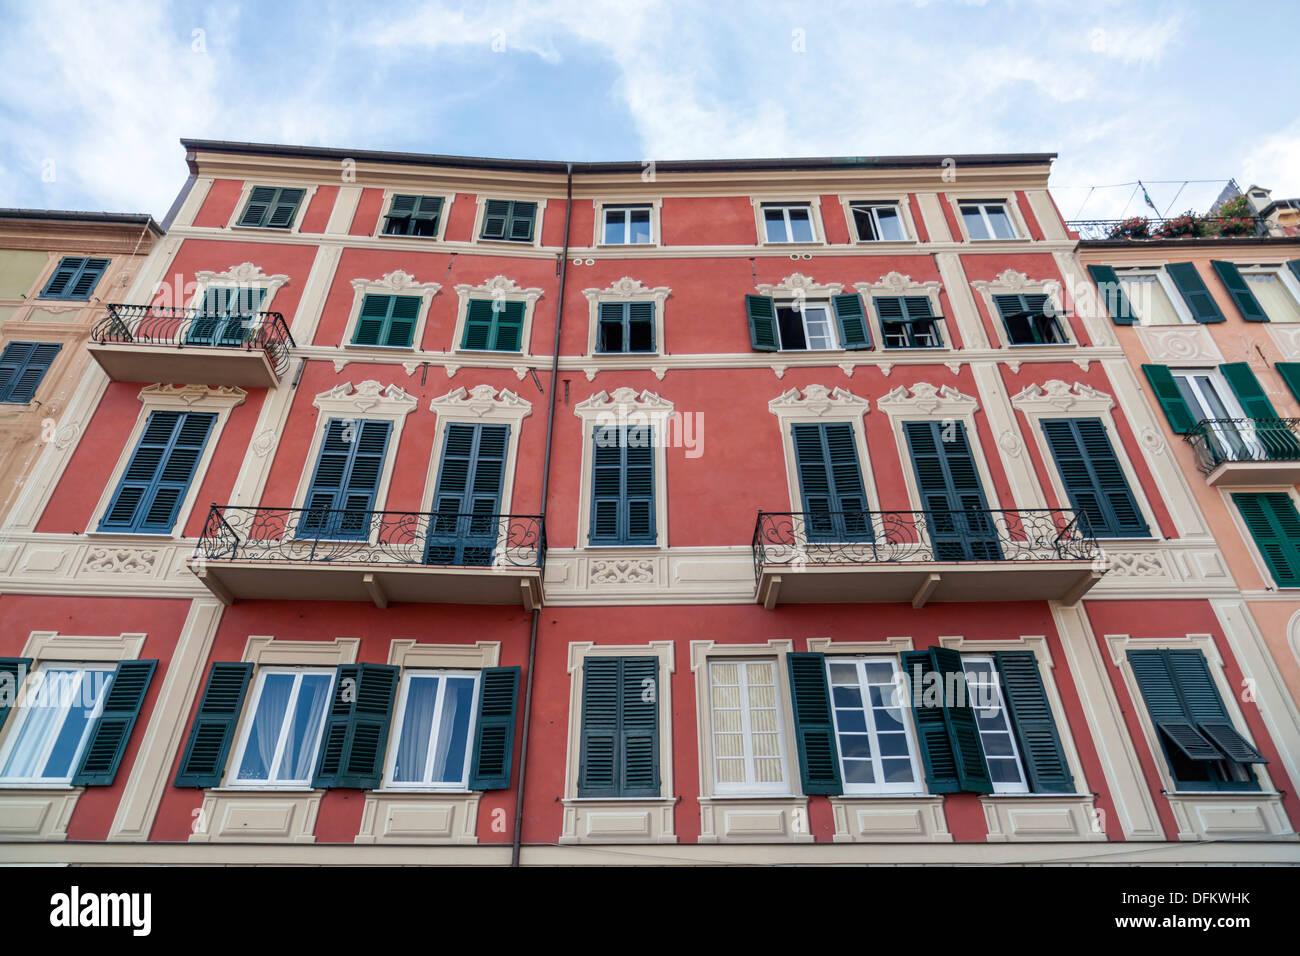 Santa Margherite Ligure,Province Genoa,Liguria,Italy Stock Photo